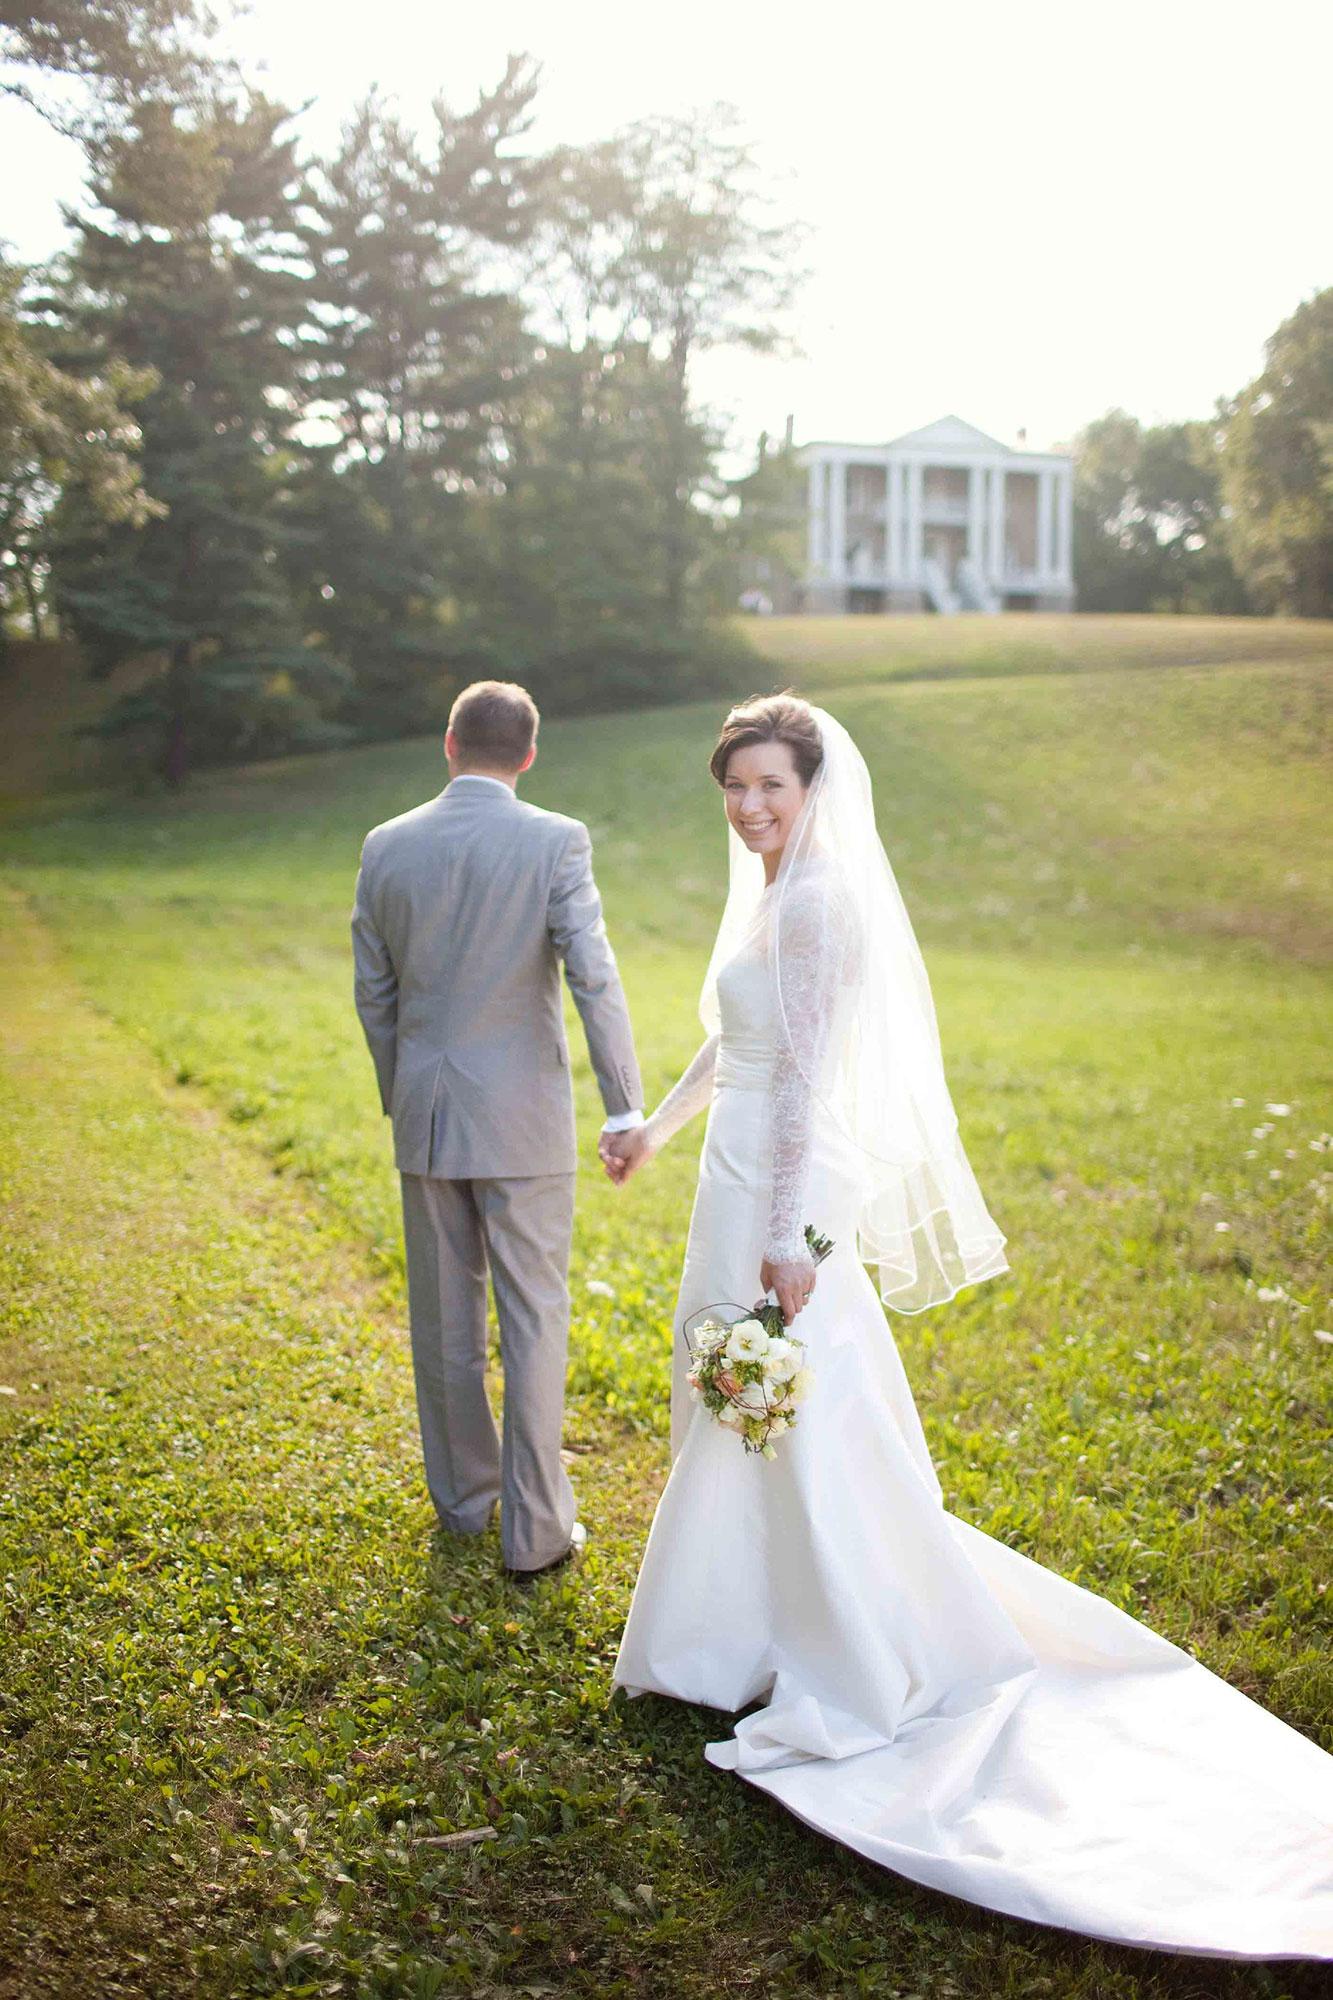 Amanda-Cowley-Willowbank-Vineyard-Bride-Photo-By-White-Photographie-032.jpg